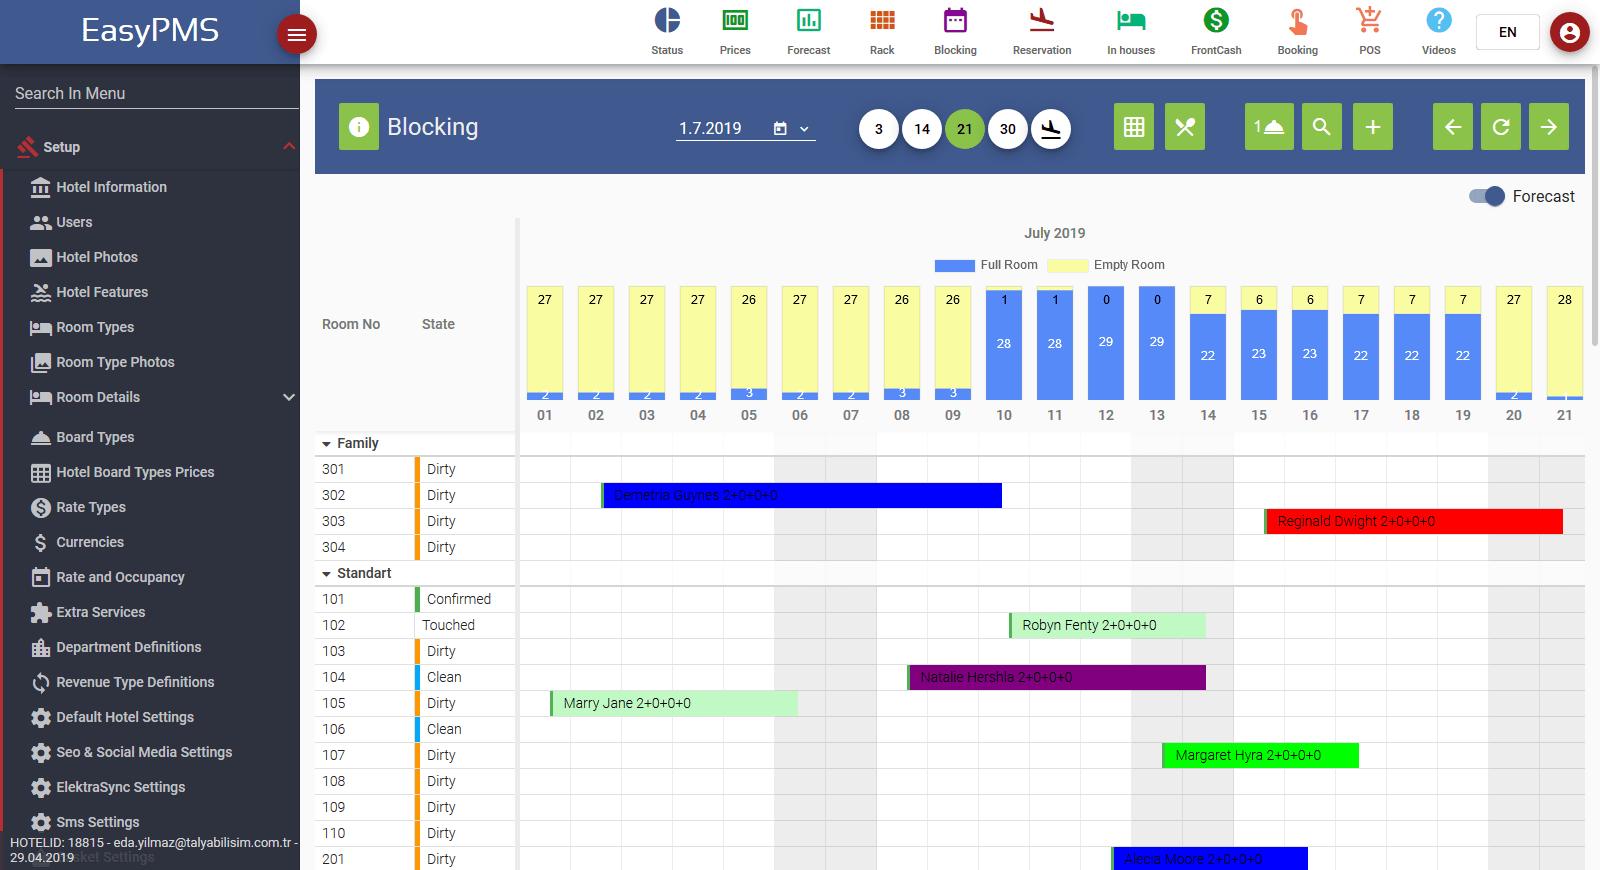 Hotel Management Software - Blocking Forecast